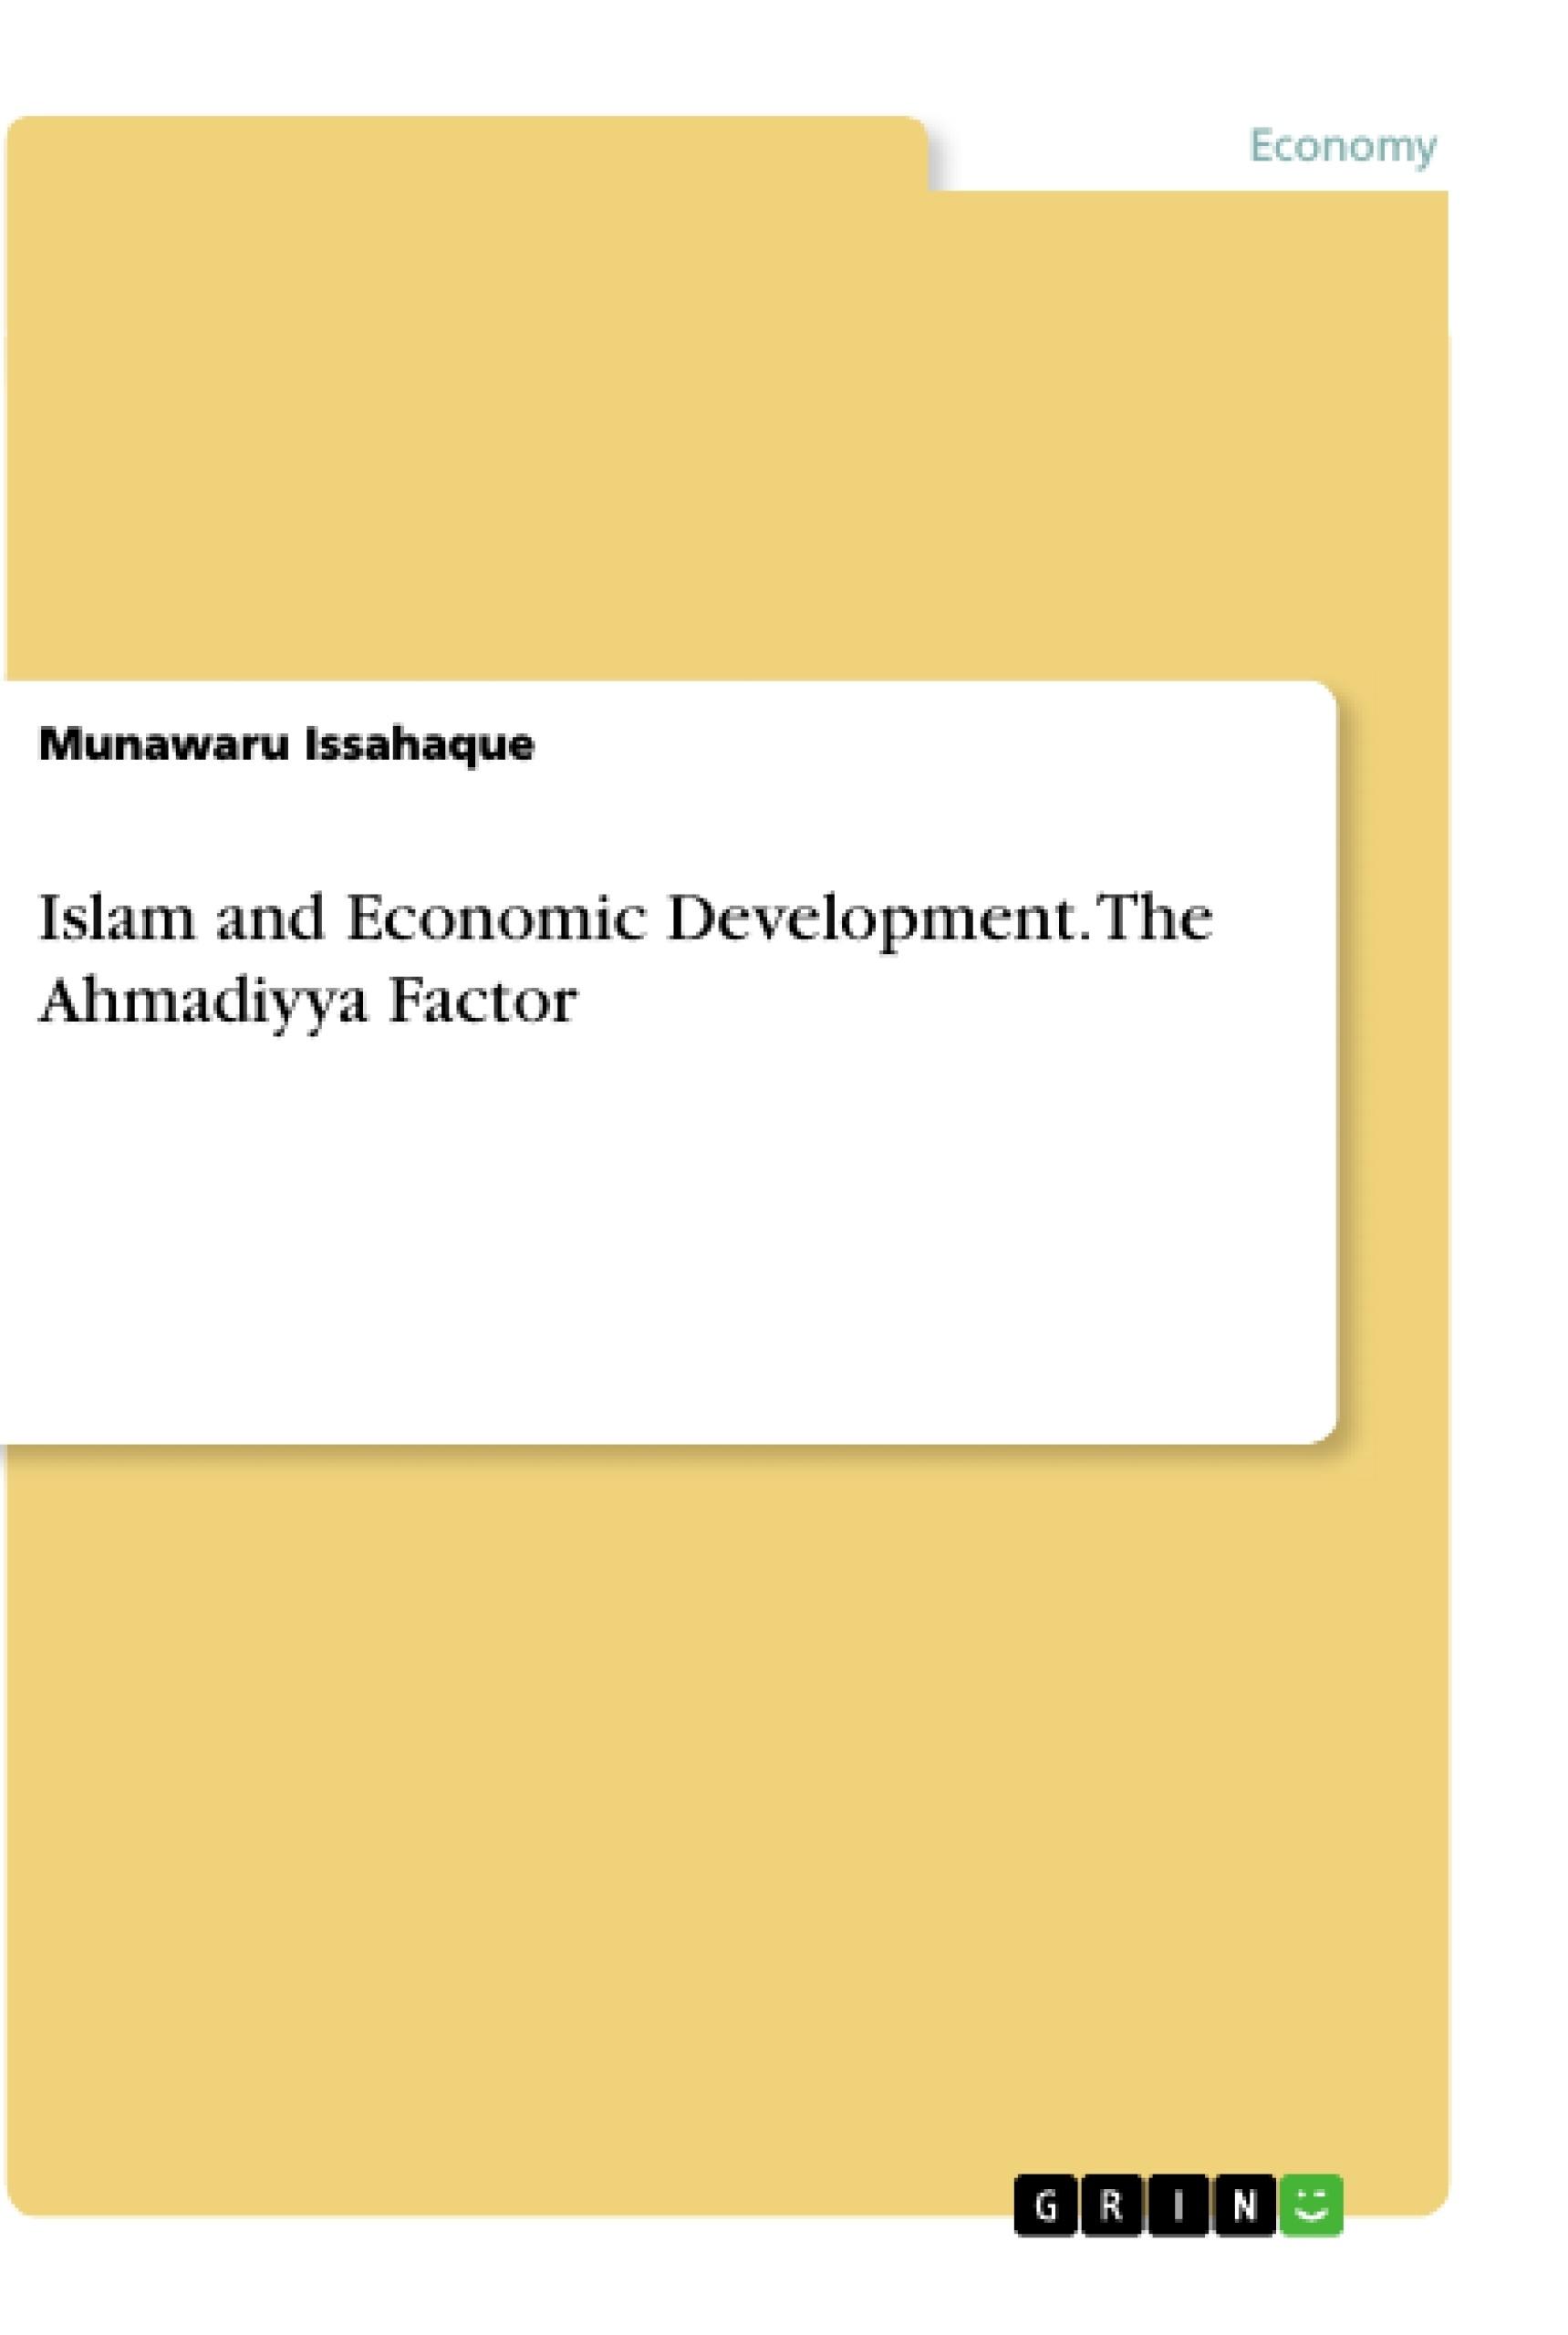 Title: Islam and Economic Development. The Ahmadiyya Factor